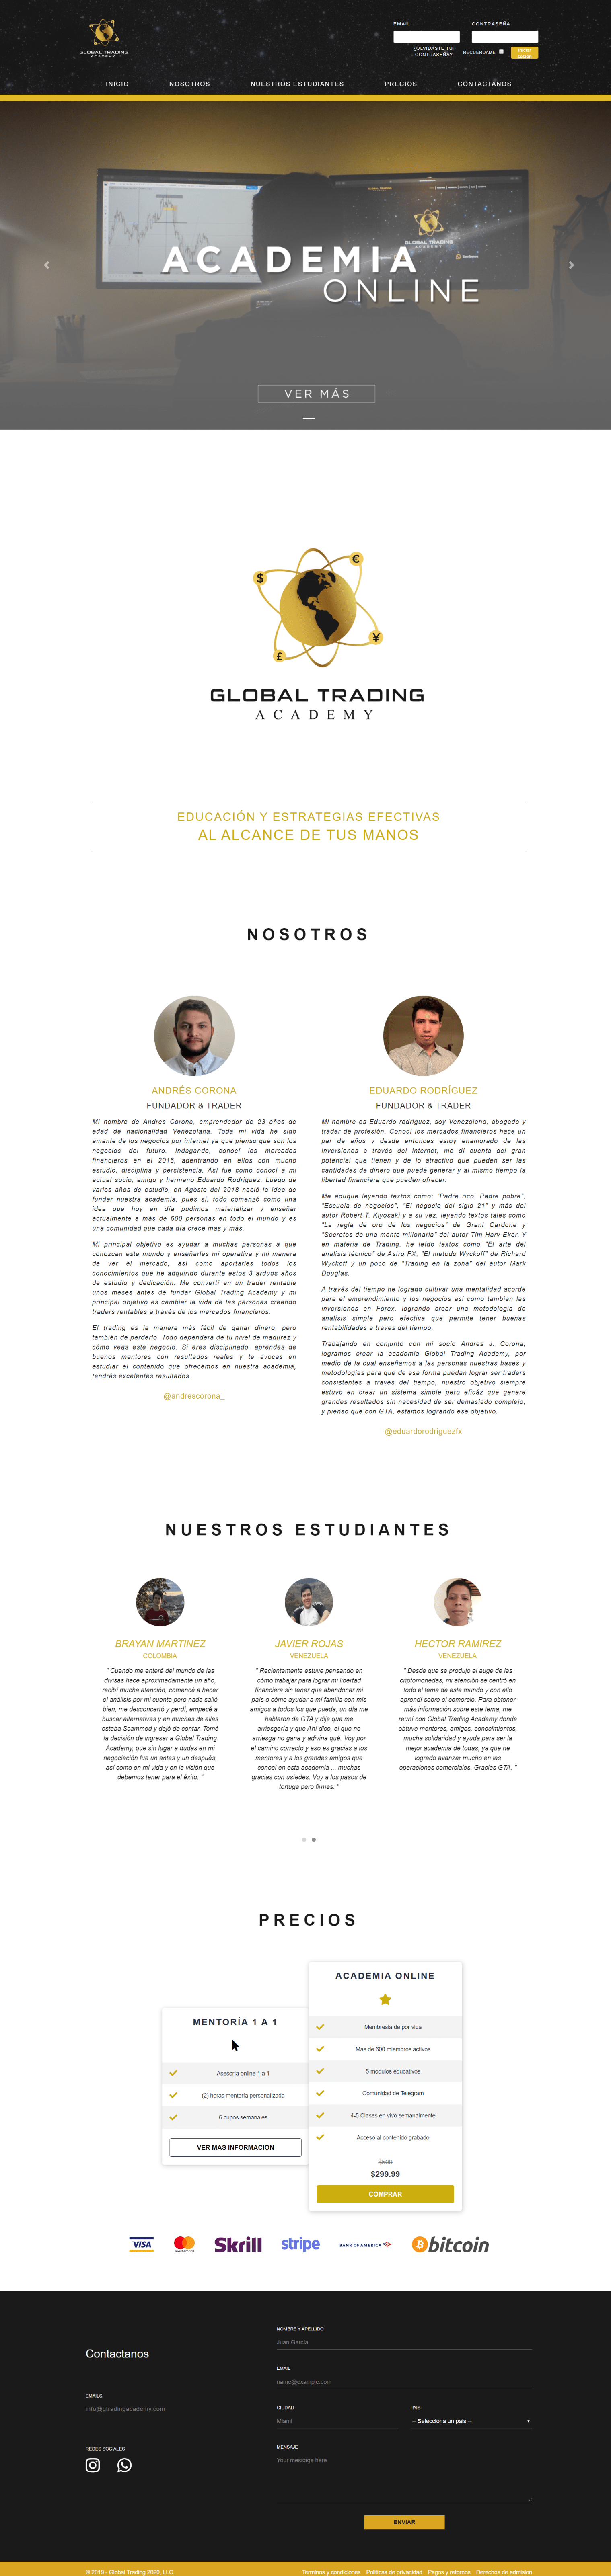 Global Trading Academy Curso